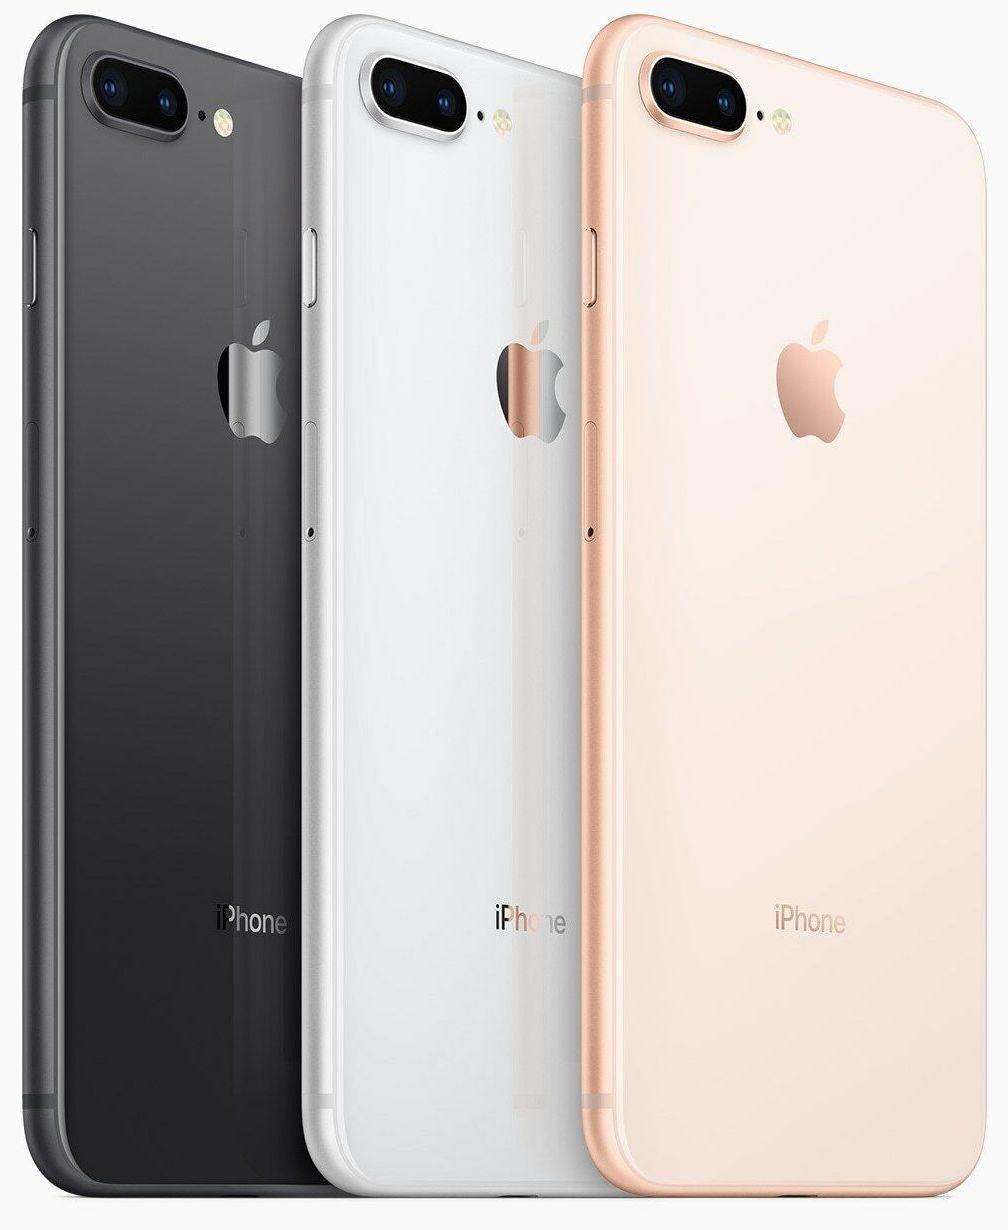 b2bd86c01 Apple iPhone 8 Plus 64GB 256GB - Verizon Unlocked T-Mobile AT T ...